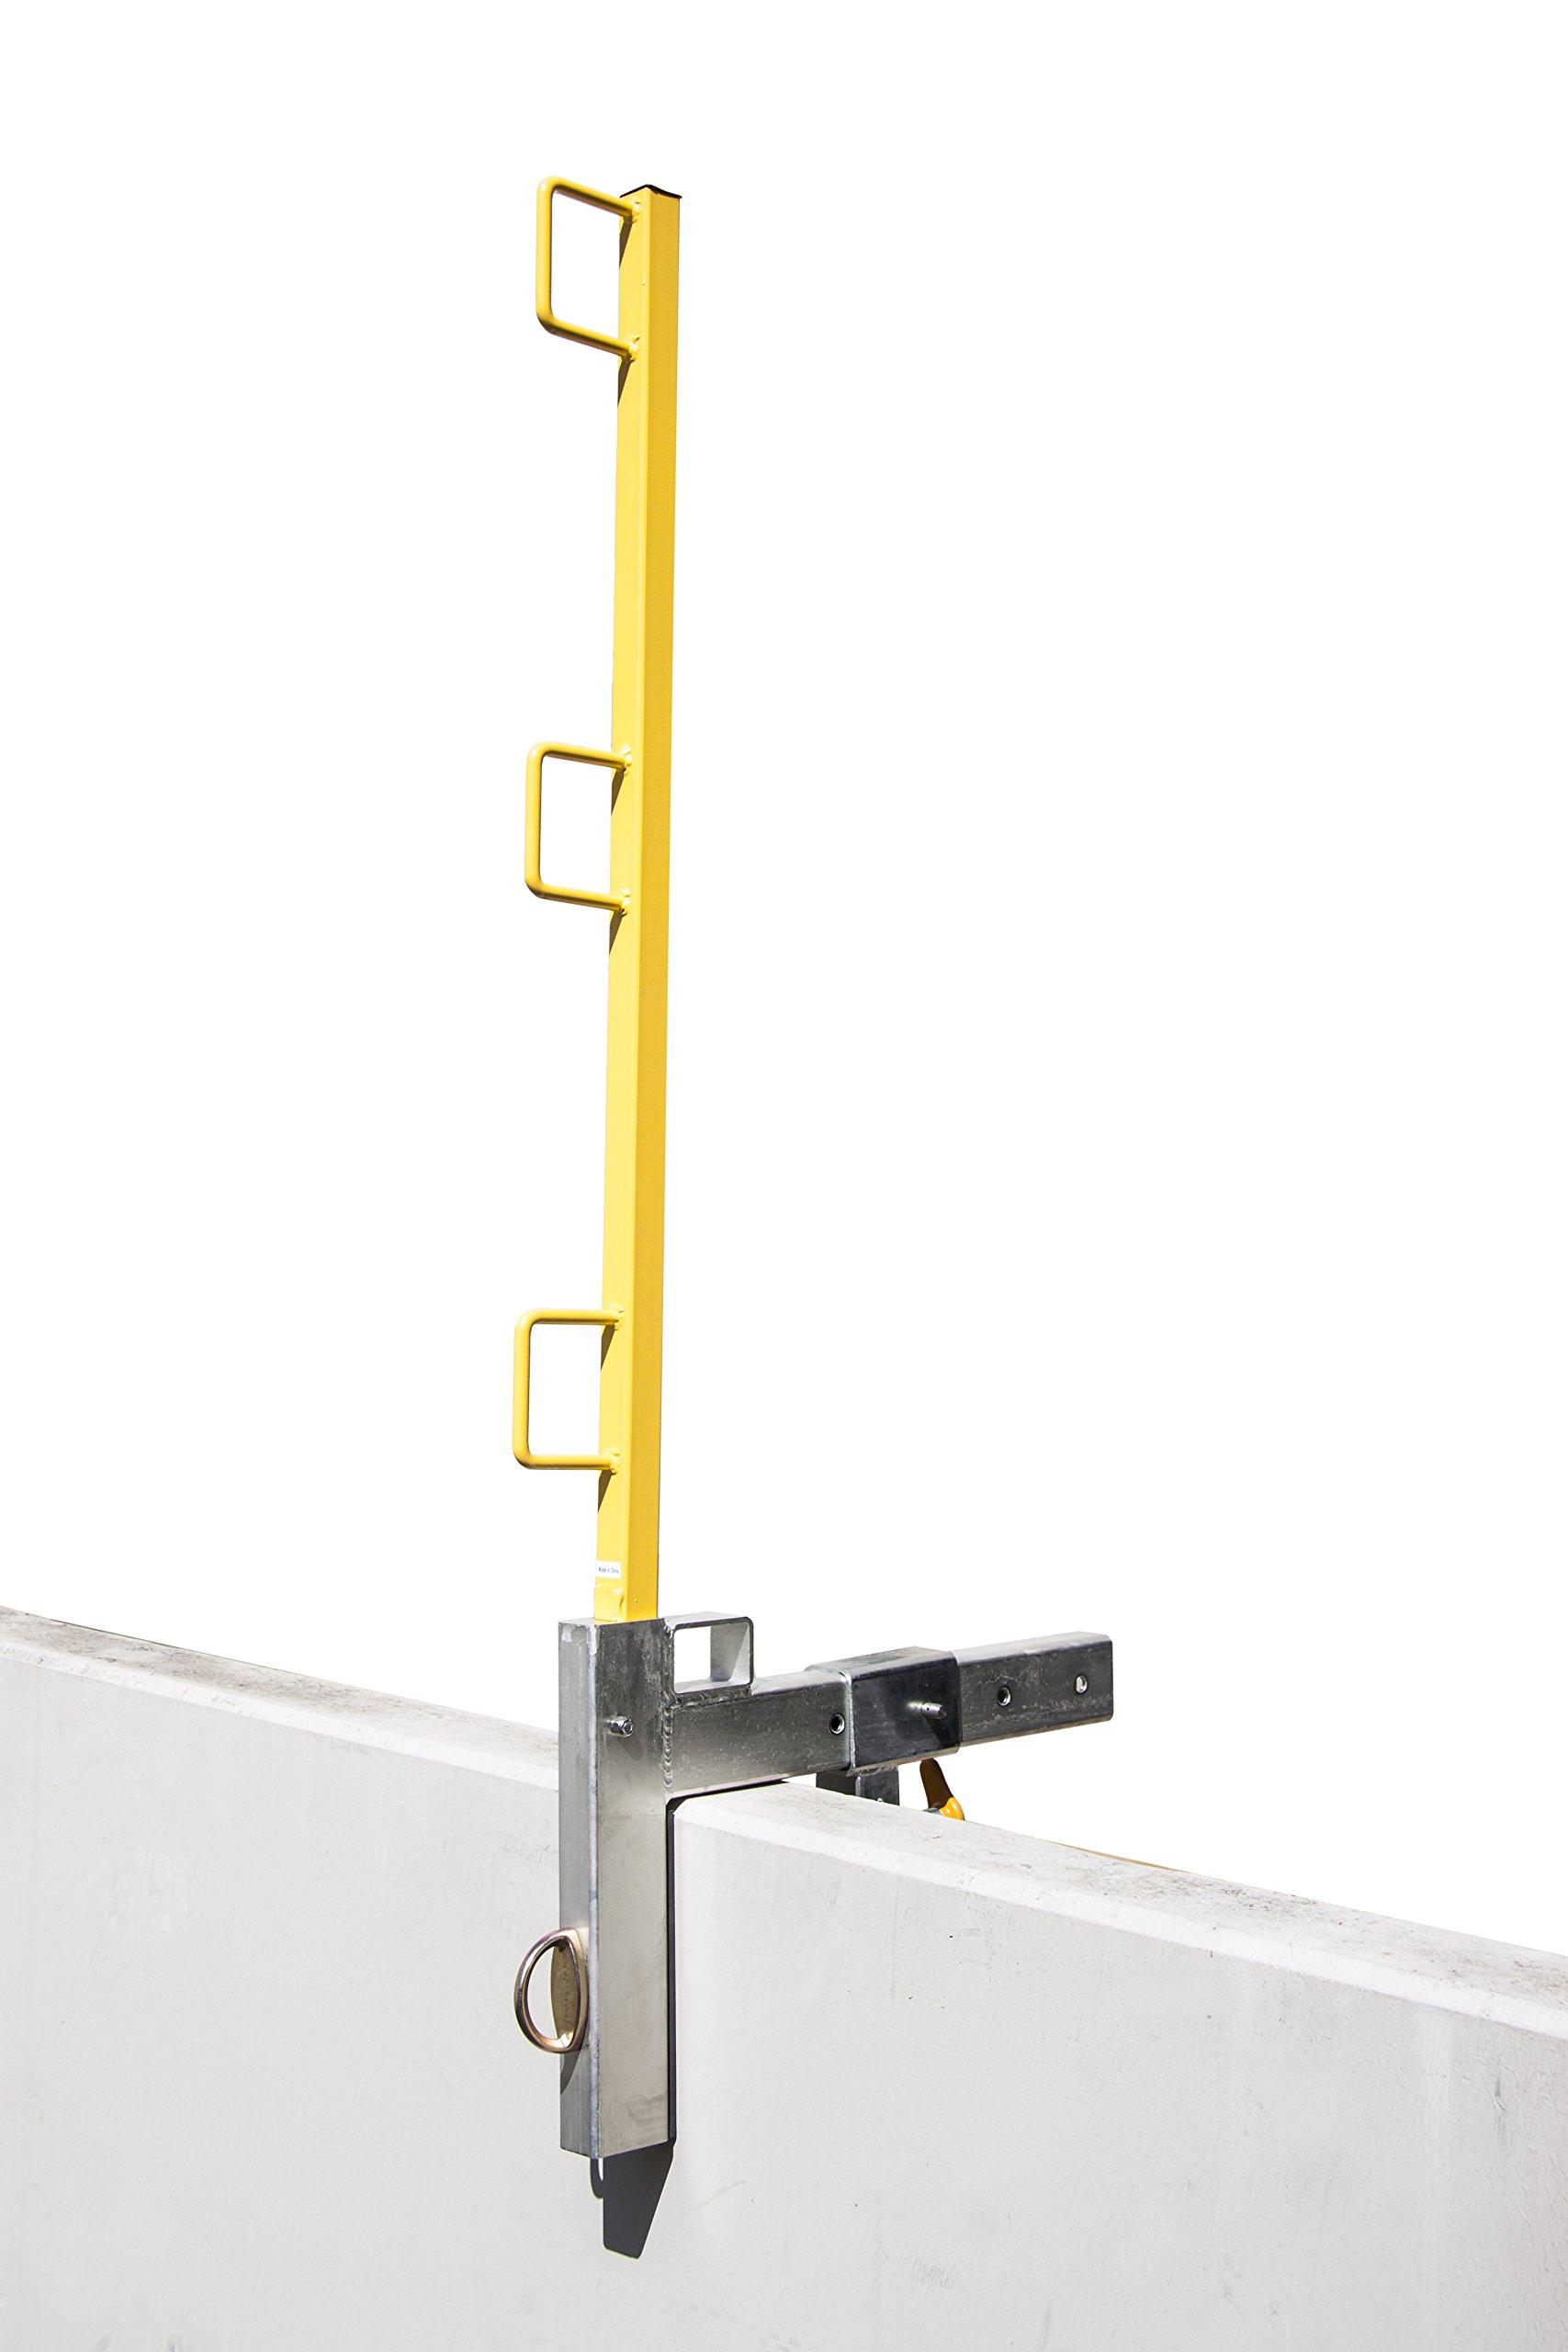 25738 Parapet Mount Bracket Adapter Surveillance Mounting Videolarm for Axis